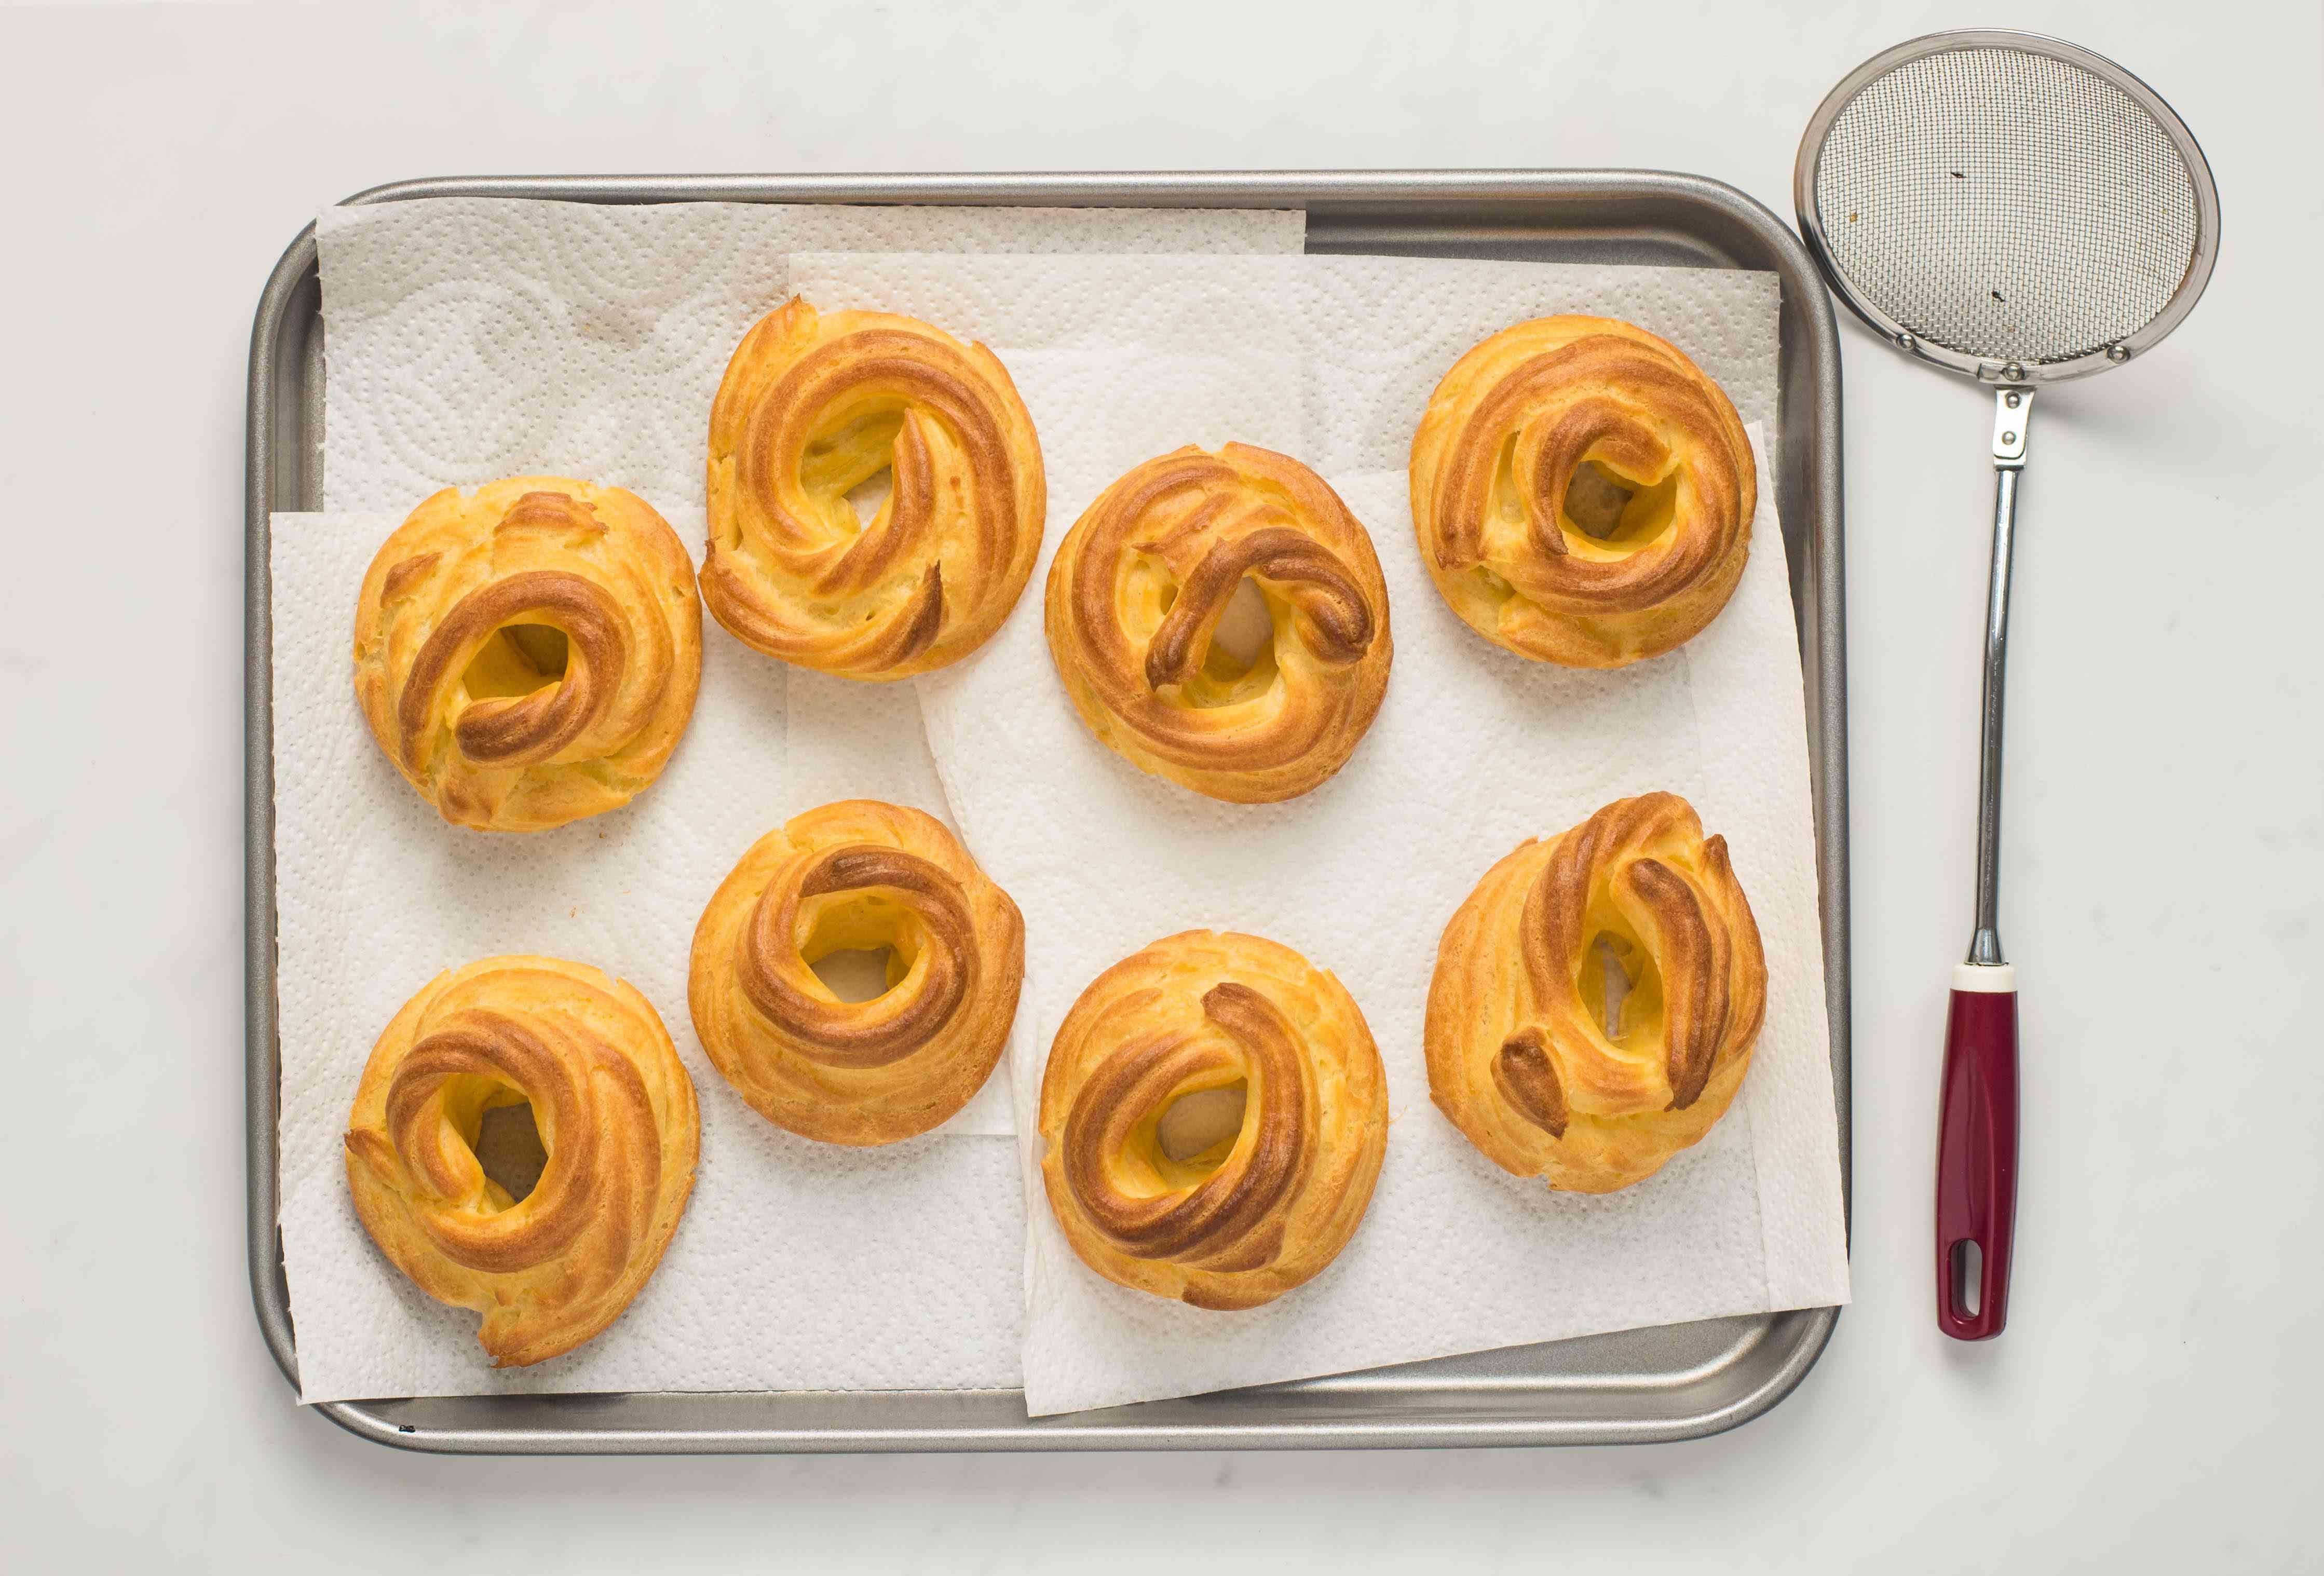 Pastry doughnuts